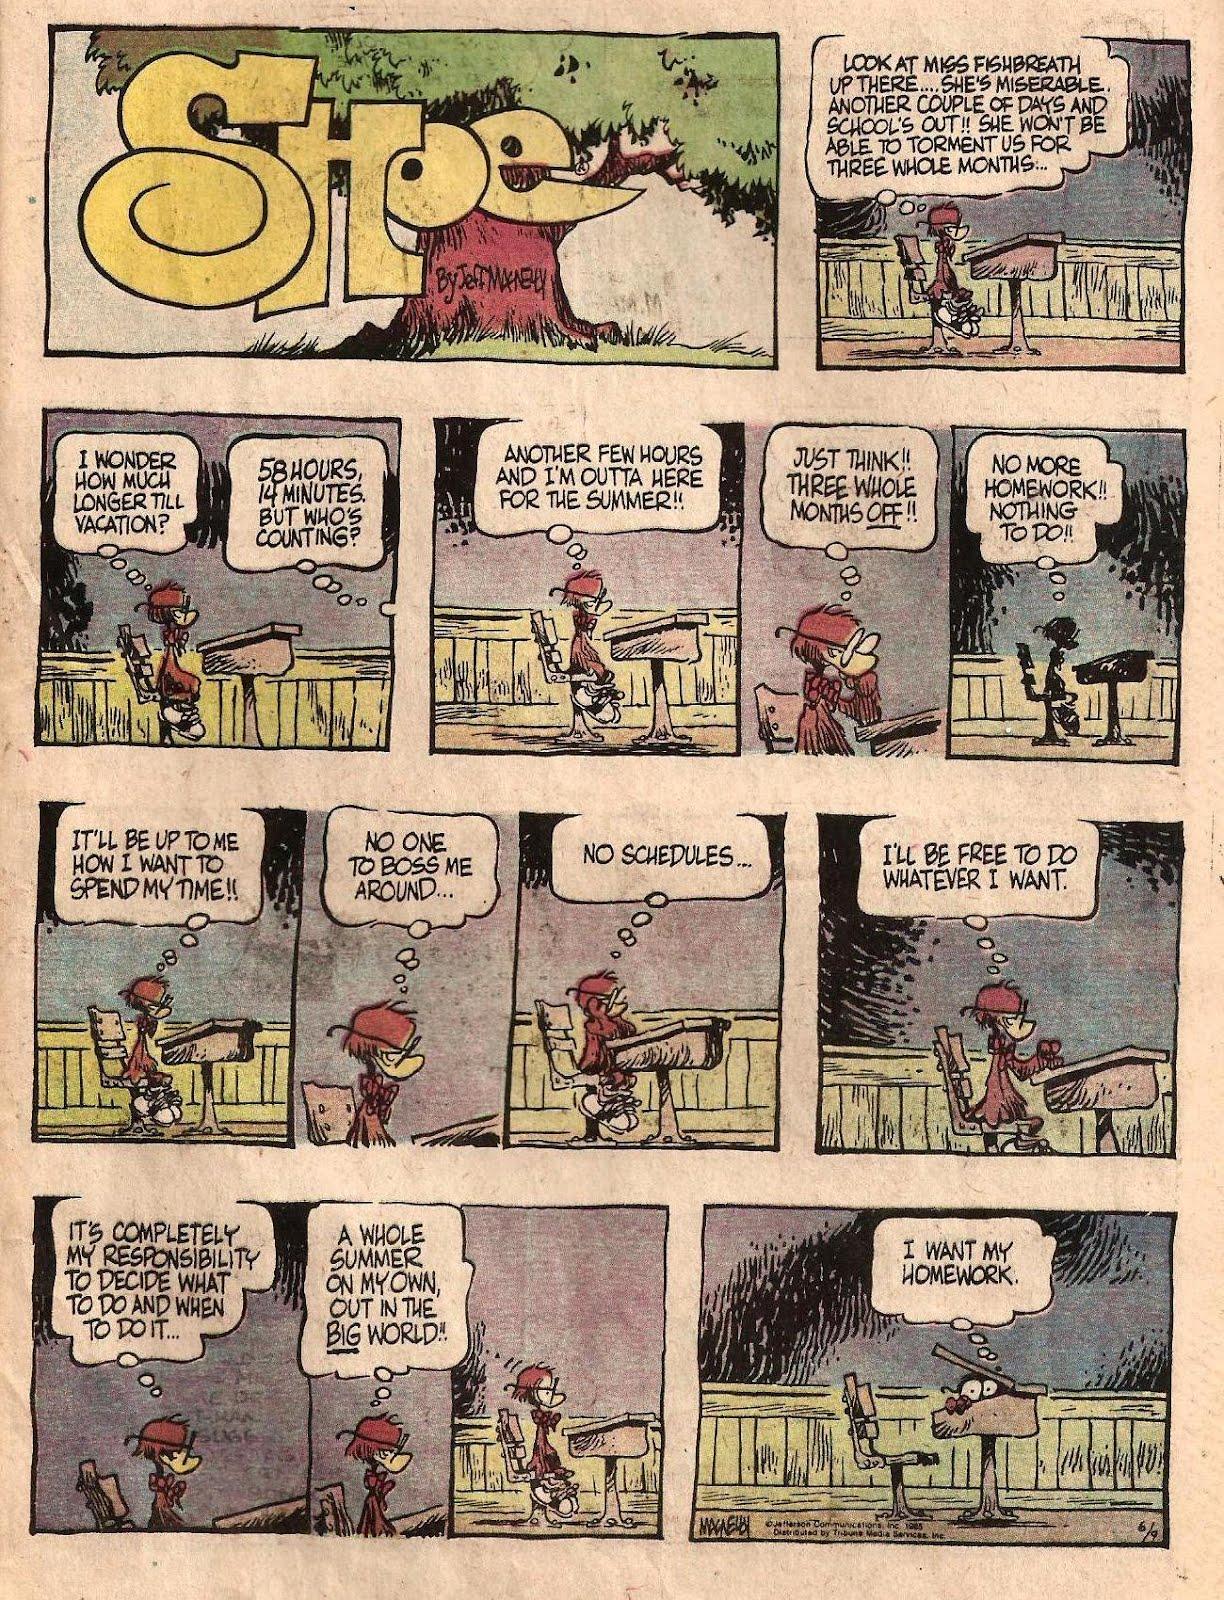 sunday comics debt skyler s essays sunday comics debt